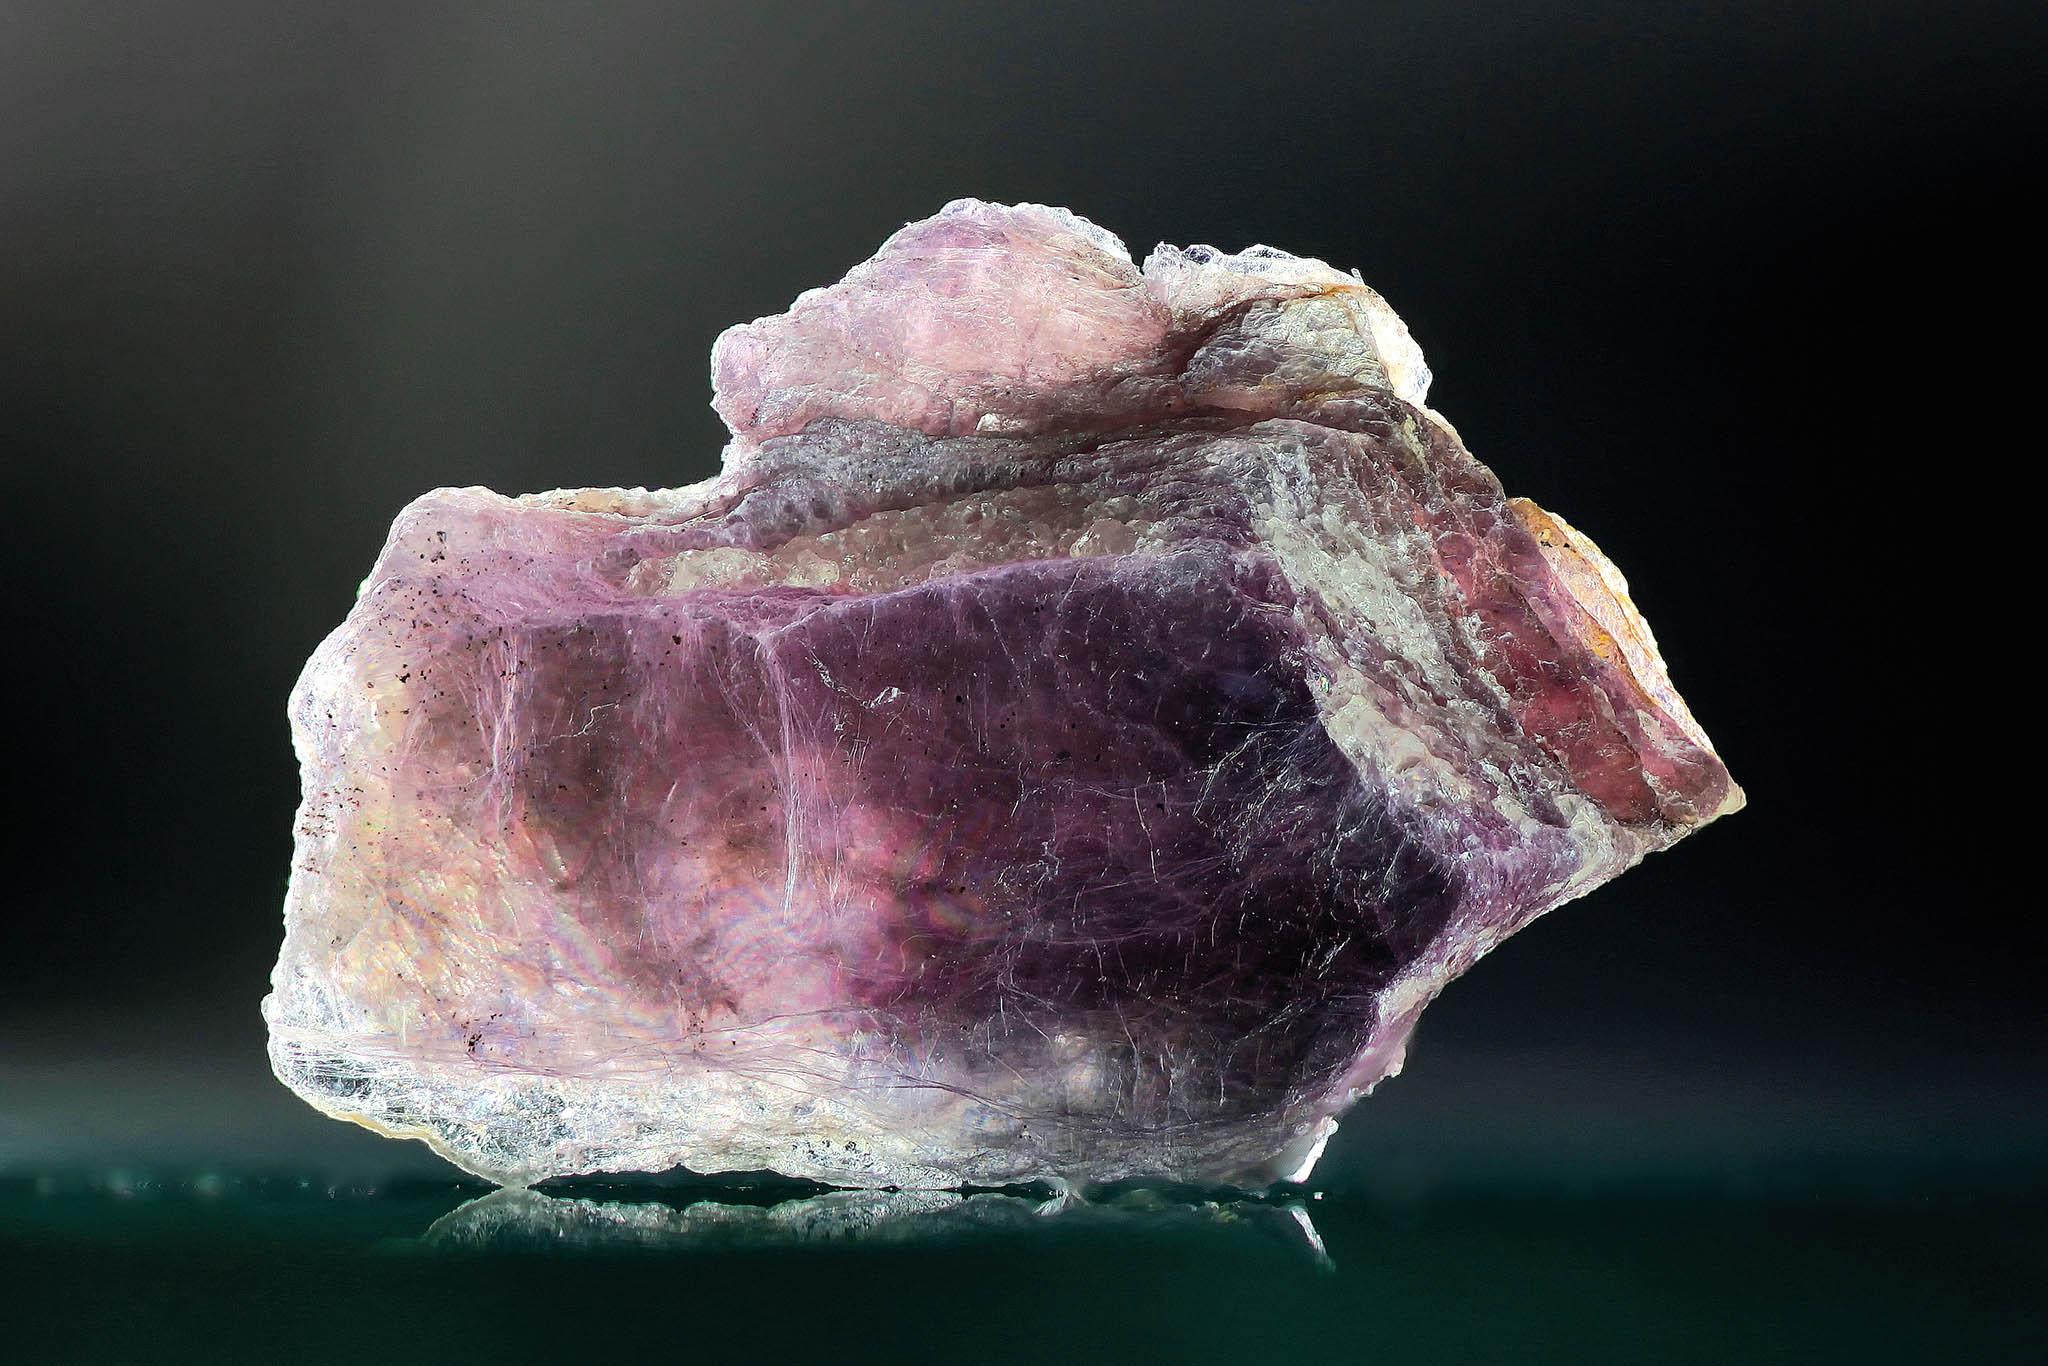 Lepidolitová slída, zdroj lithia